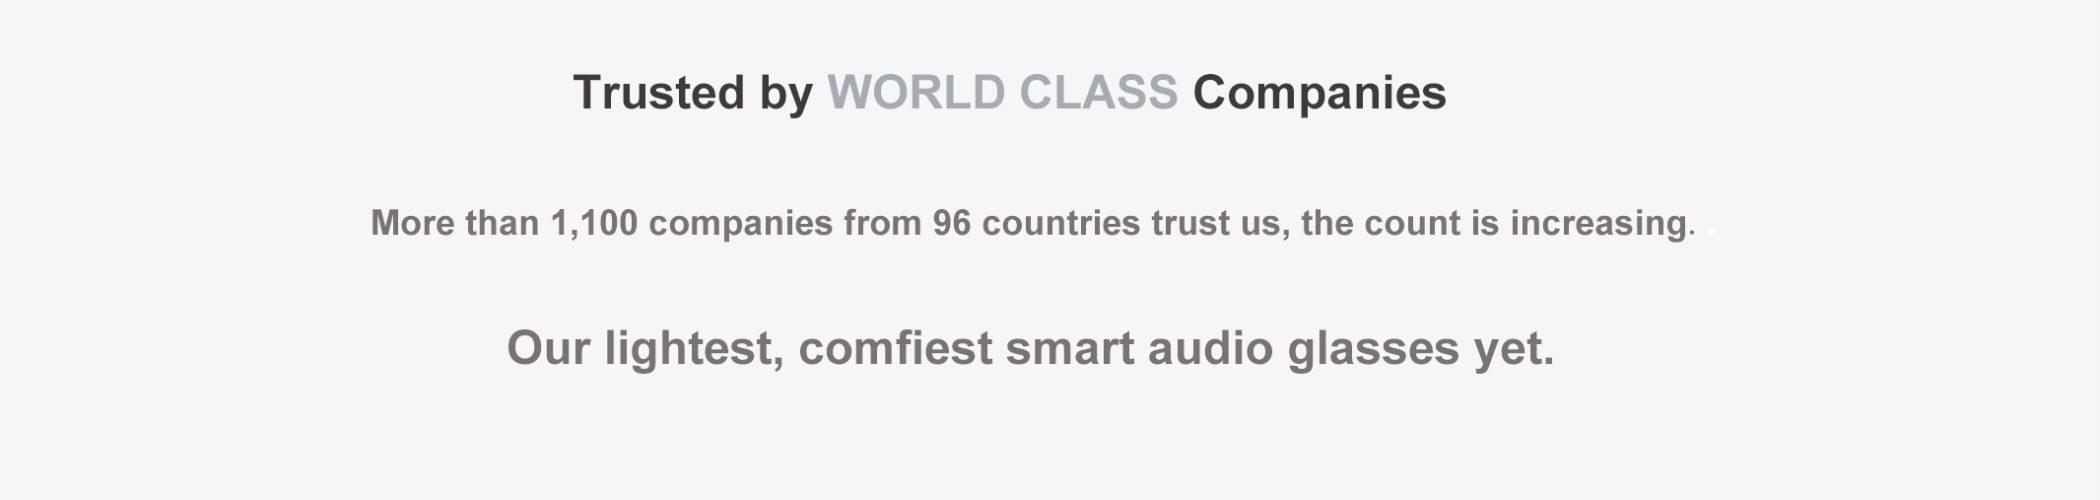 corsca wireless audio glasses